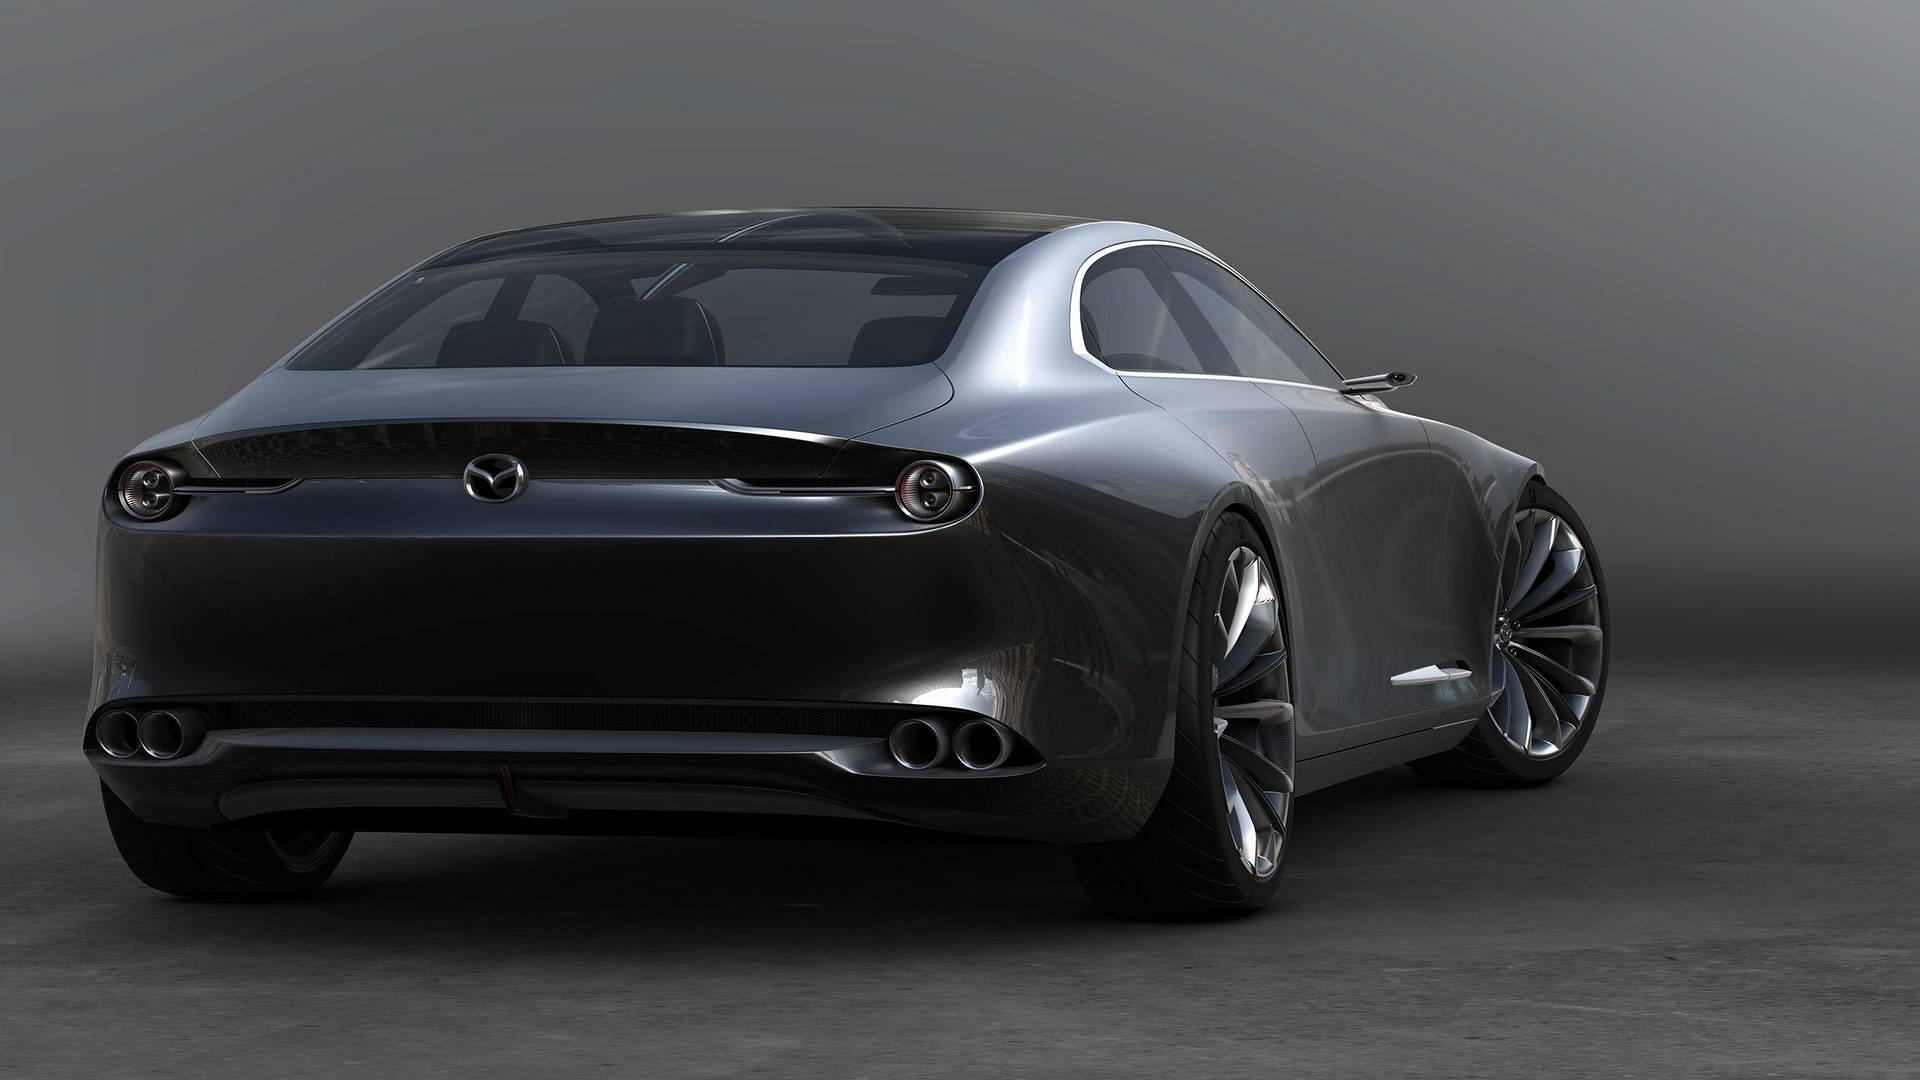 mazda vision coupe concept 2 alles auto. Black Bedroom Furniture Sets. Home Design Ideas